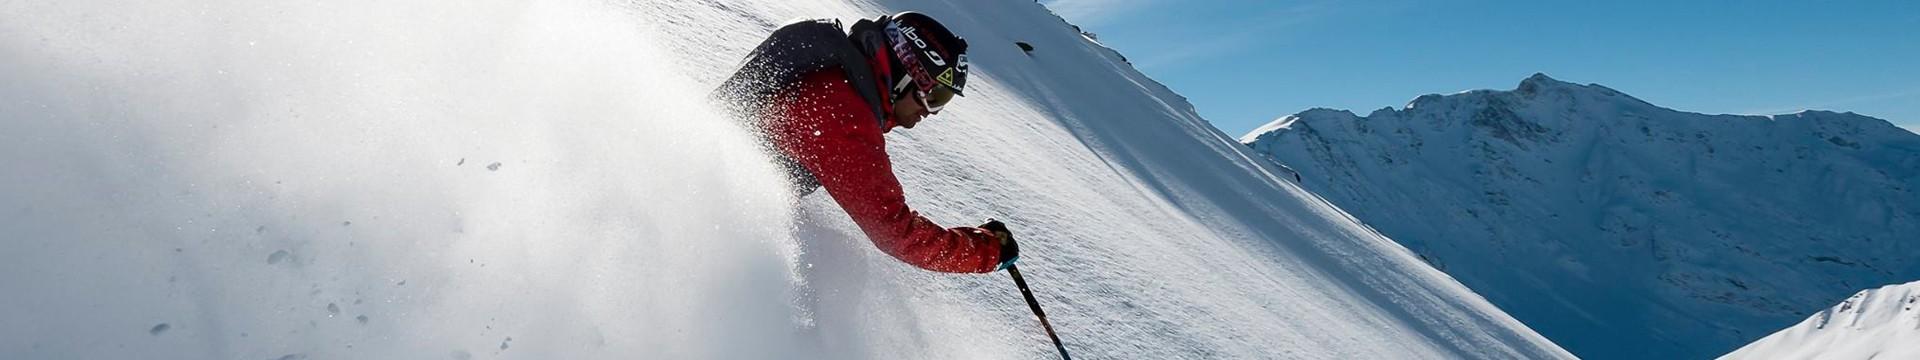 ski-06-8840